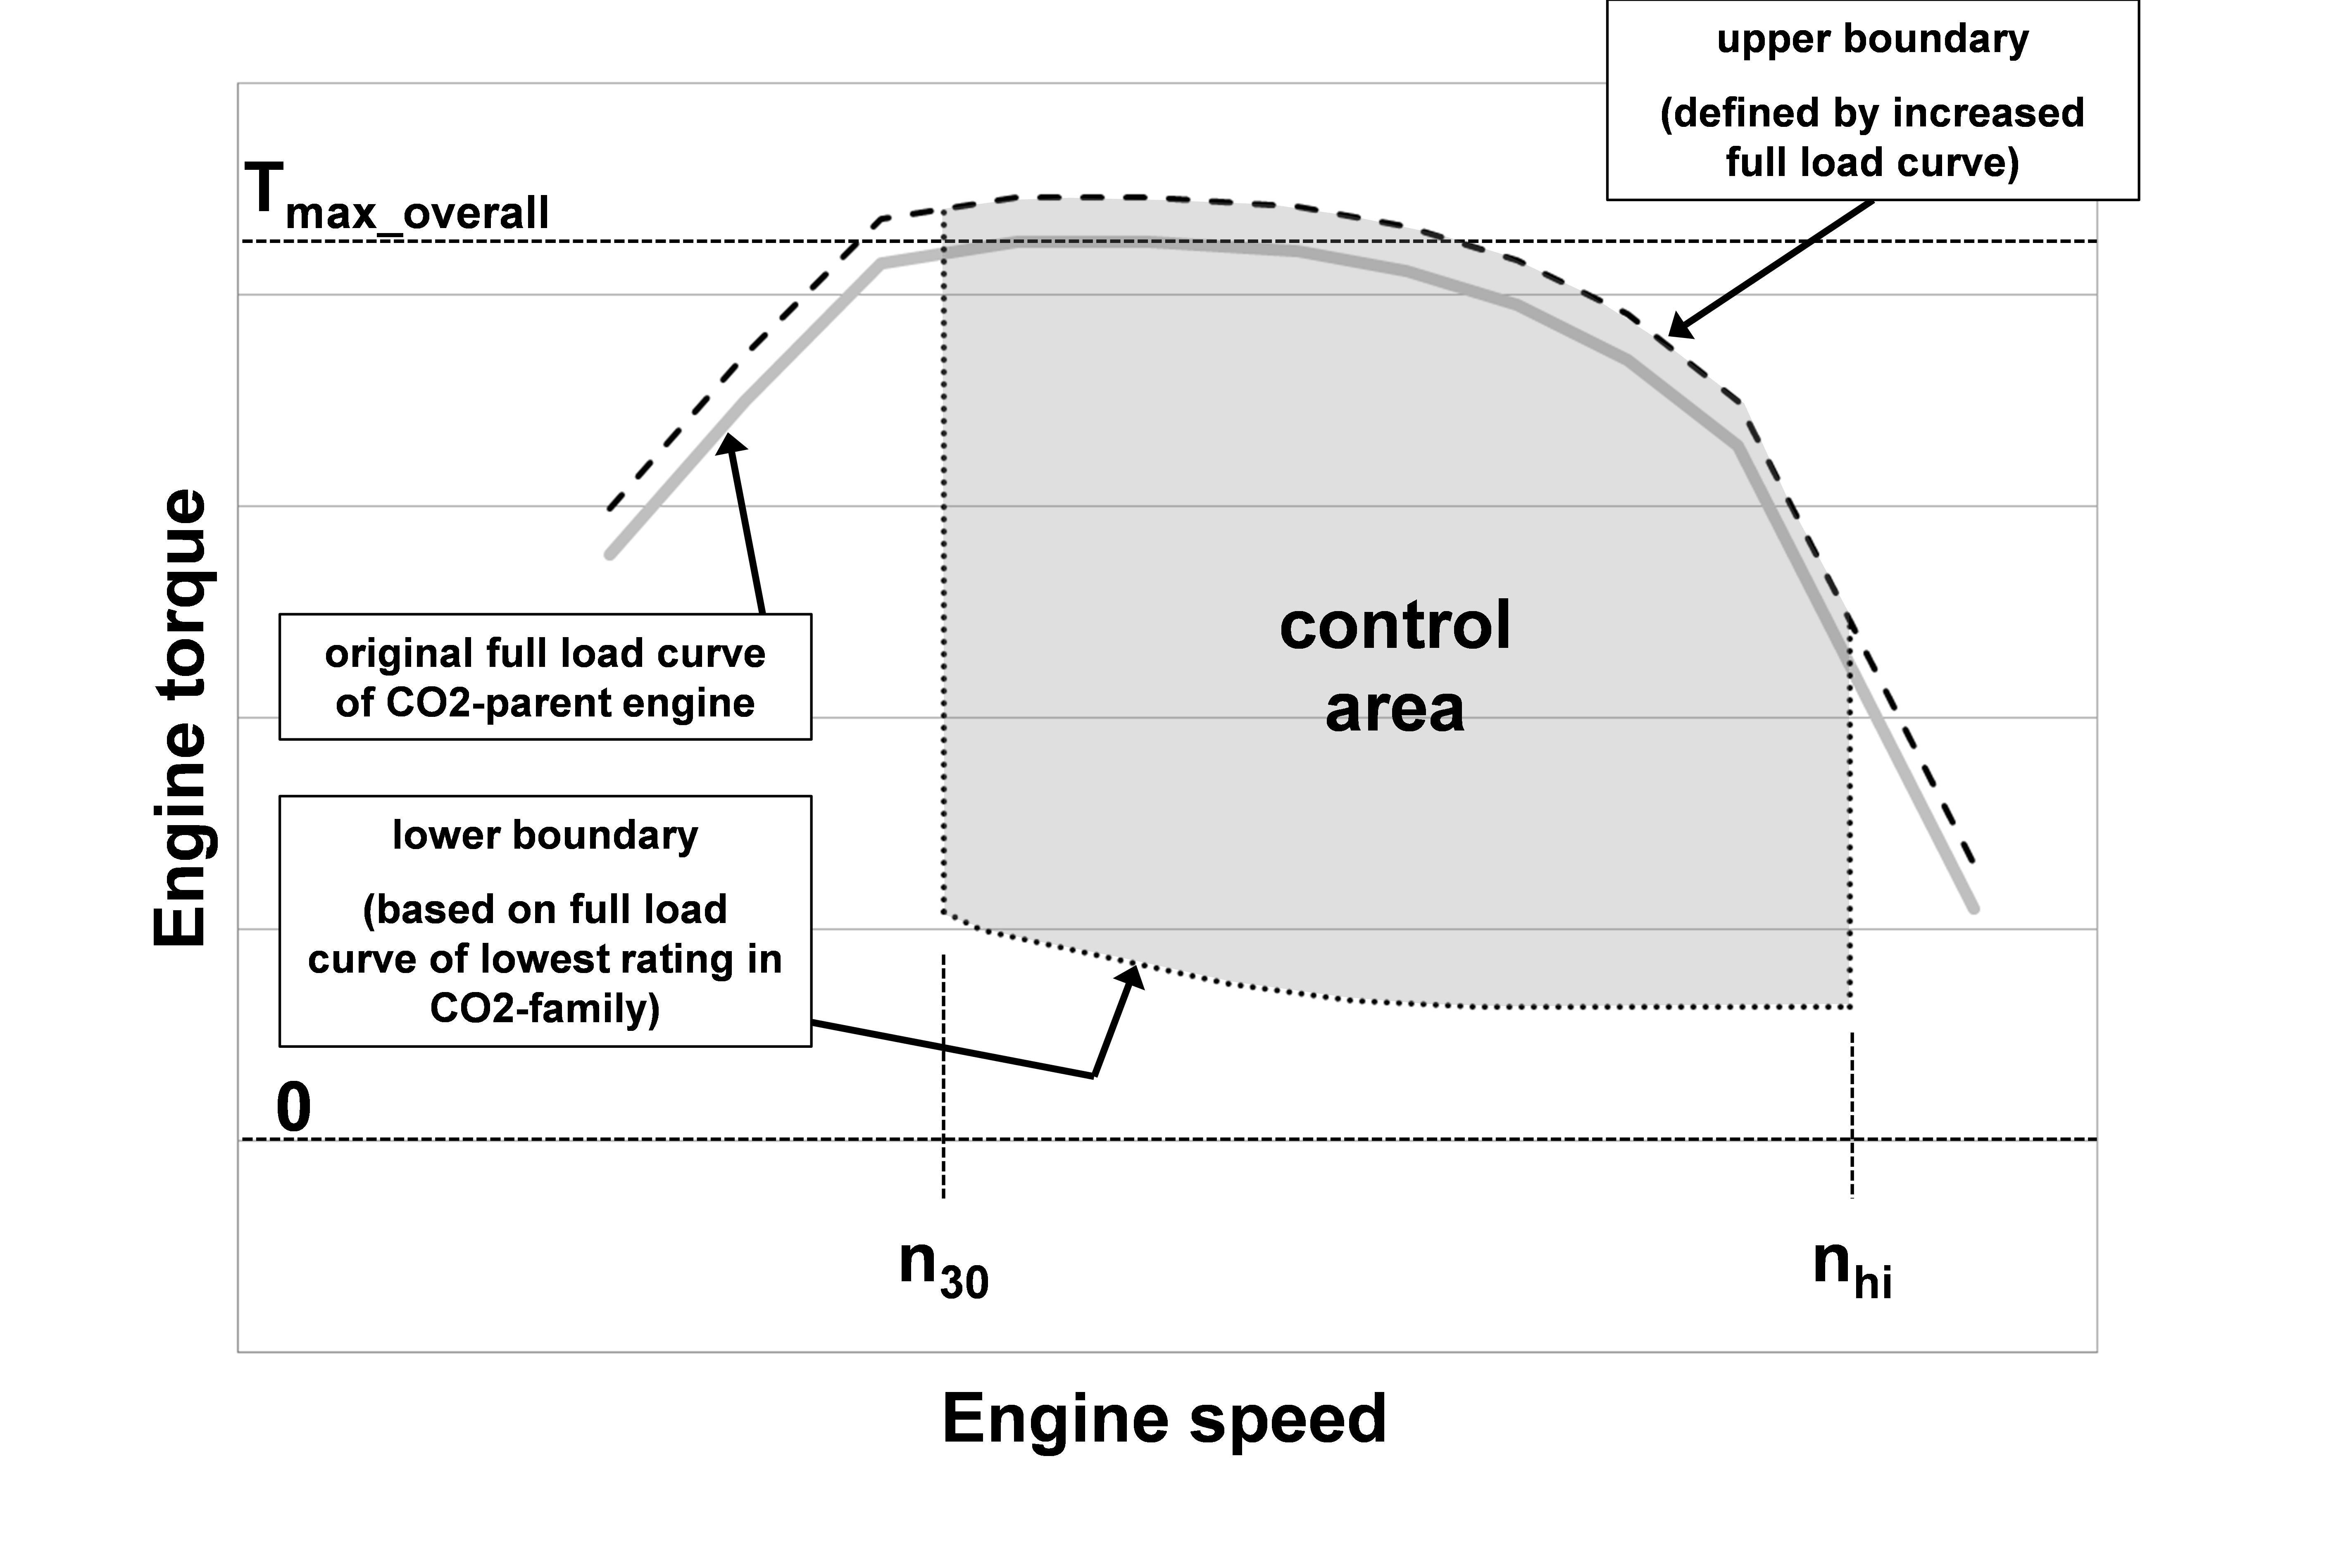 Pv Diagram for Petrol Engine Eur Lex C 2017 7937 En Eur Lex Of Pv Diagram for Petrol Engine